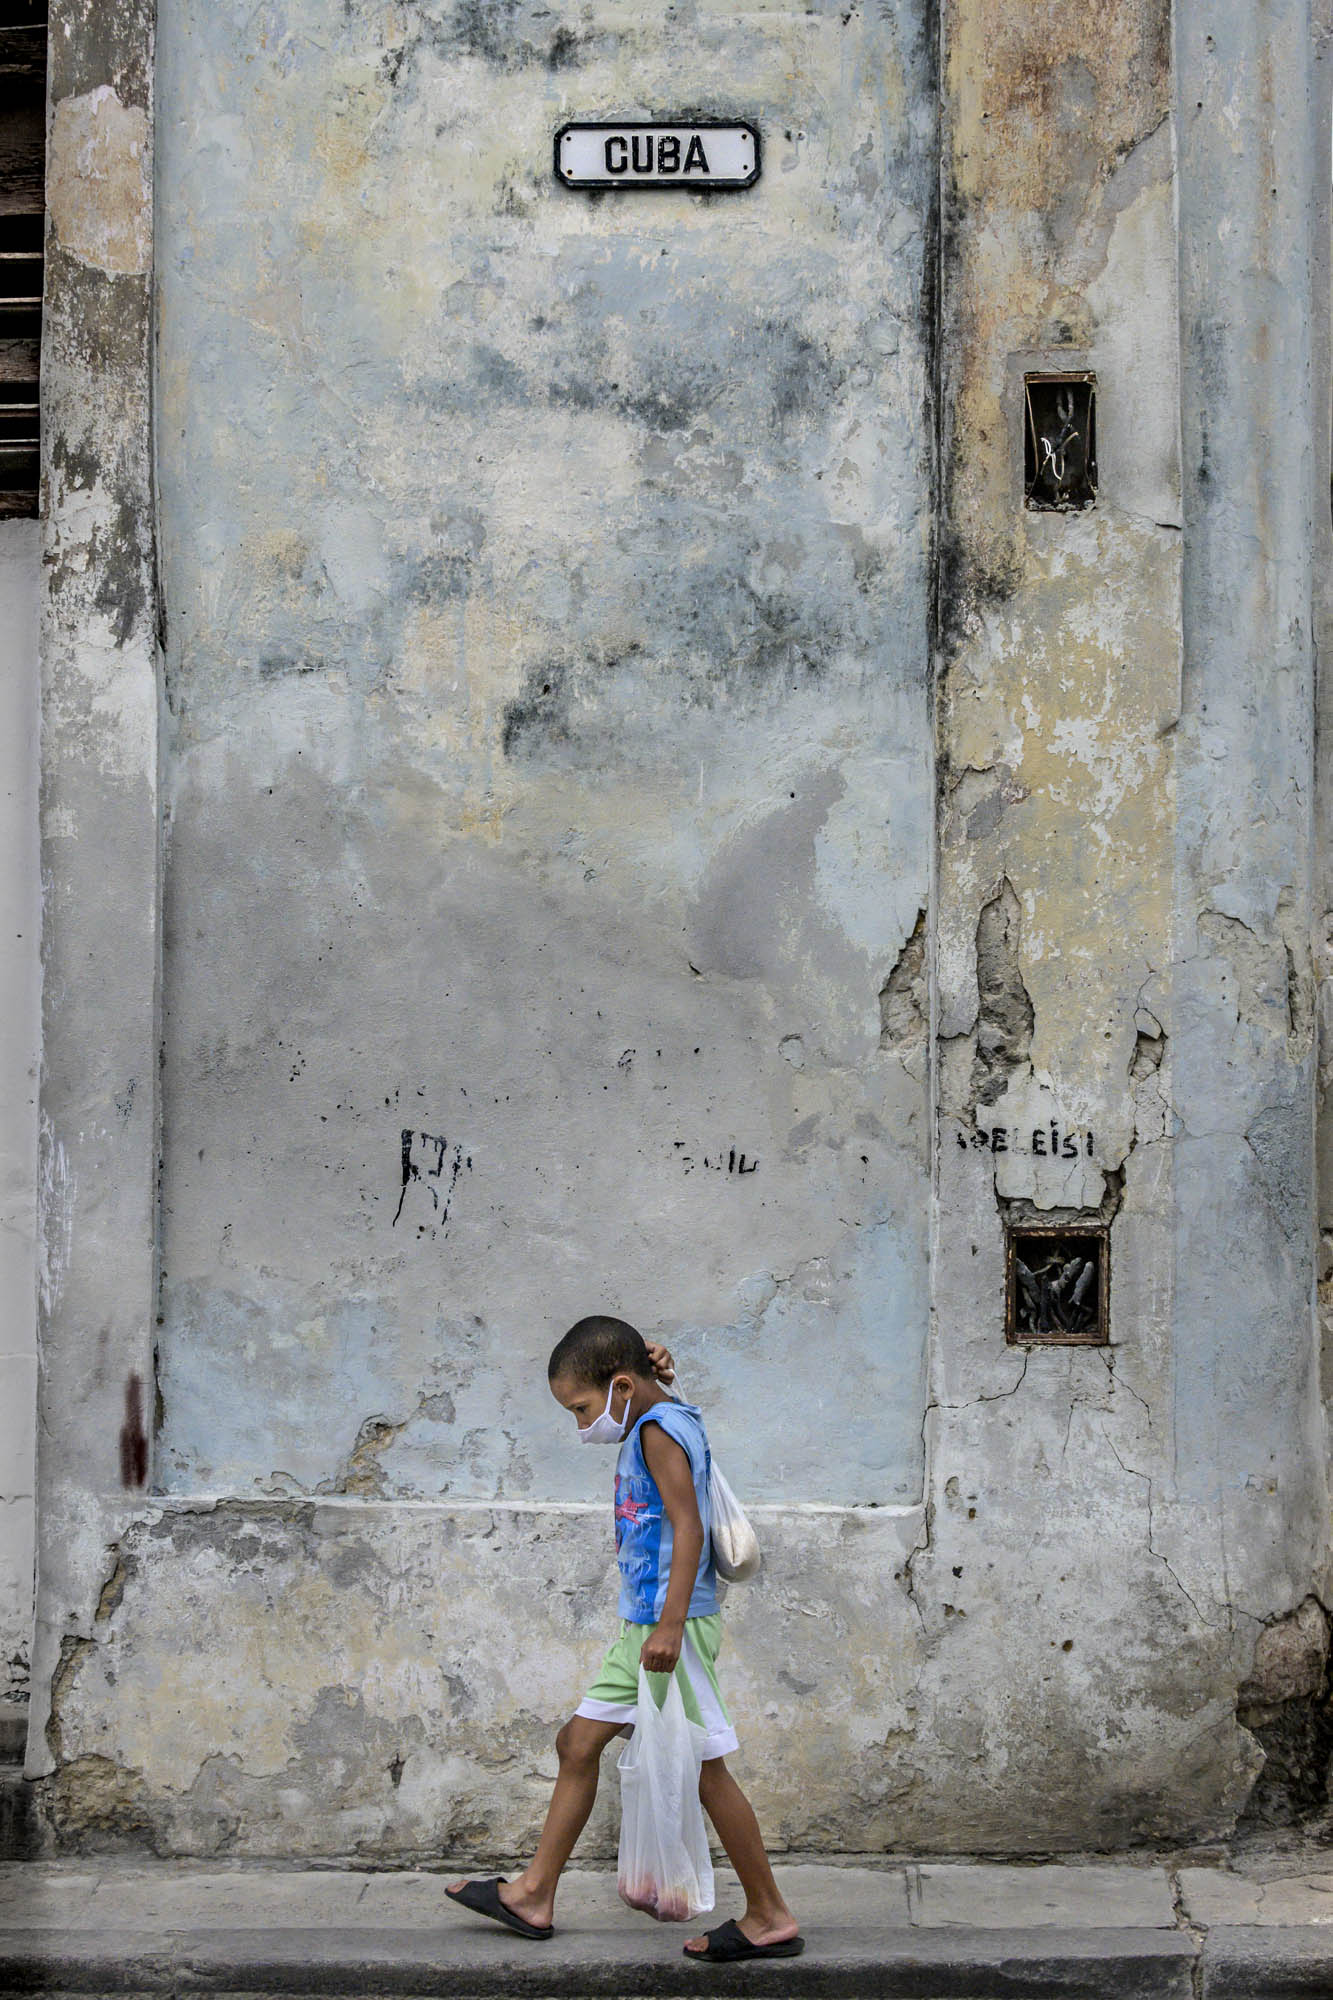 Jaba - Cuba - Hector Garrido, Aerial and human photography